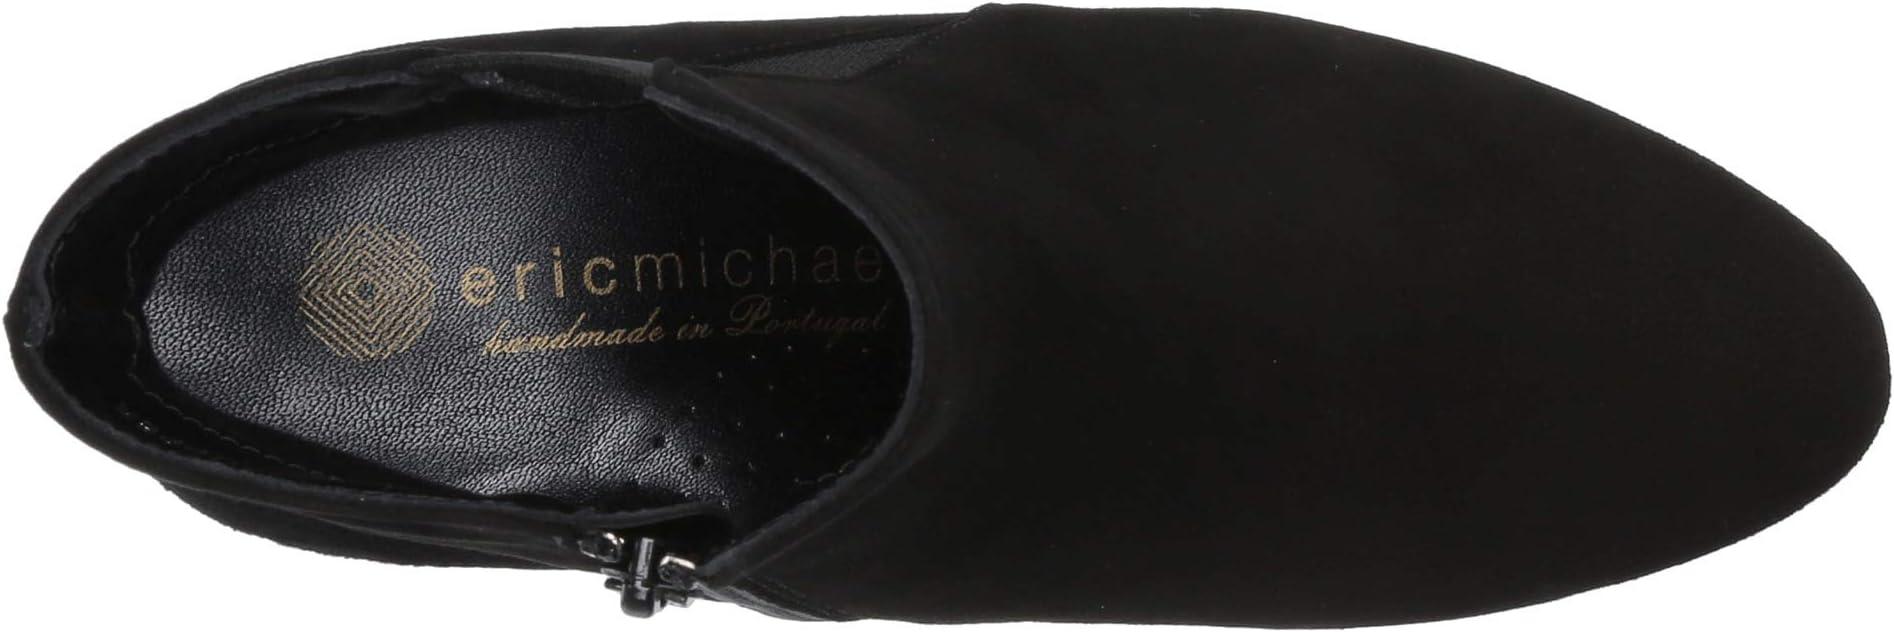 Eric Michael Shoshana | Women's shoes | 2020 Newest